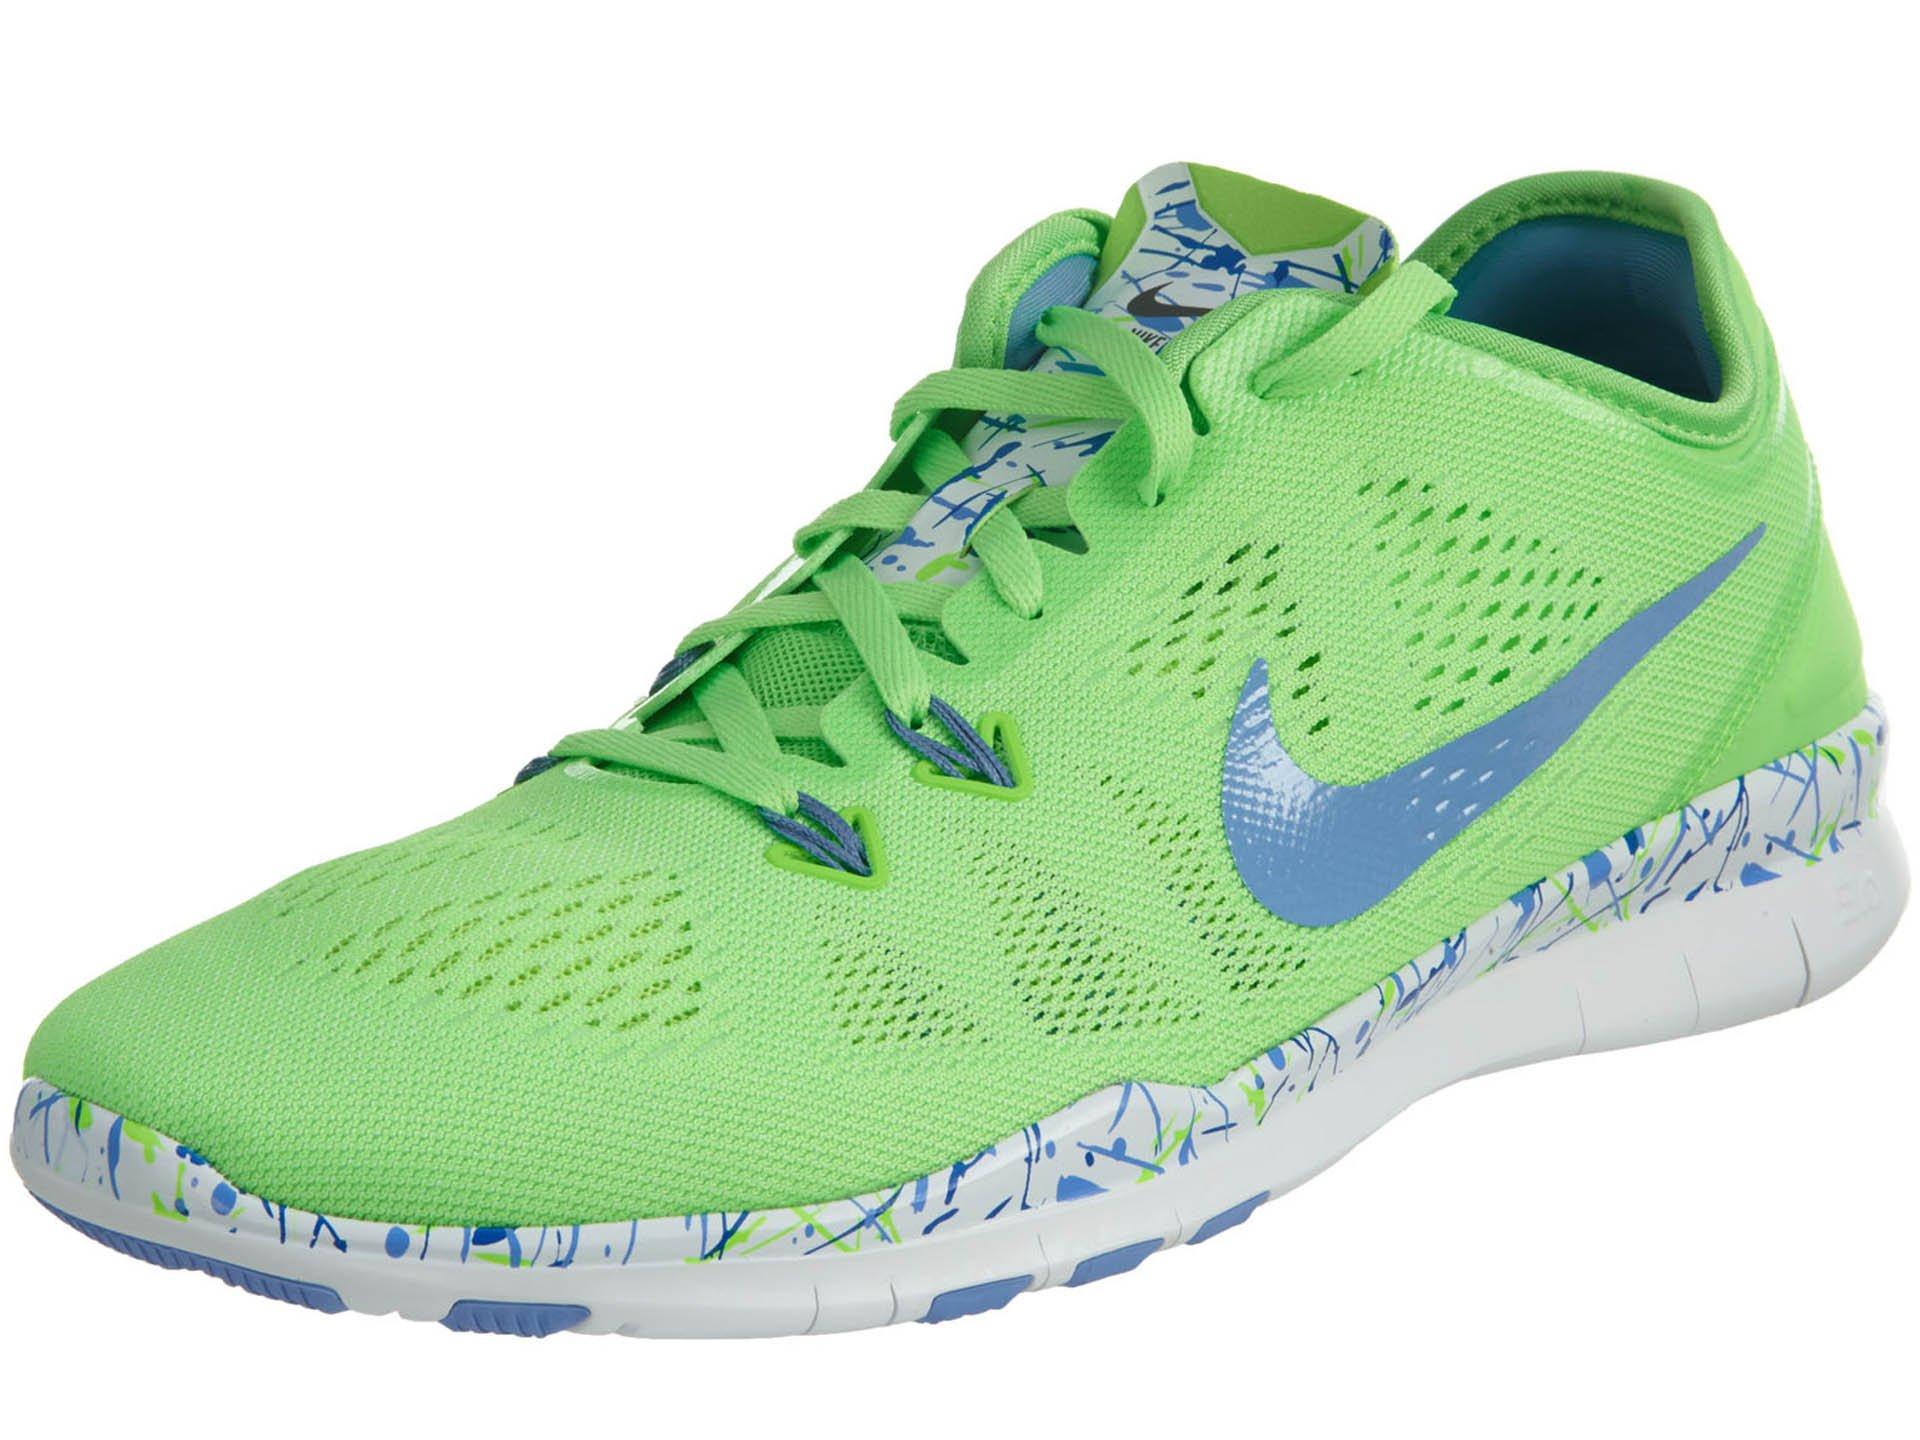 Nike Blazer Mid, Green Abyss/Sail Uk Size: 8.5